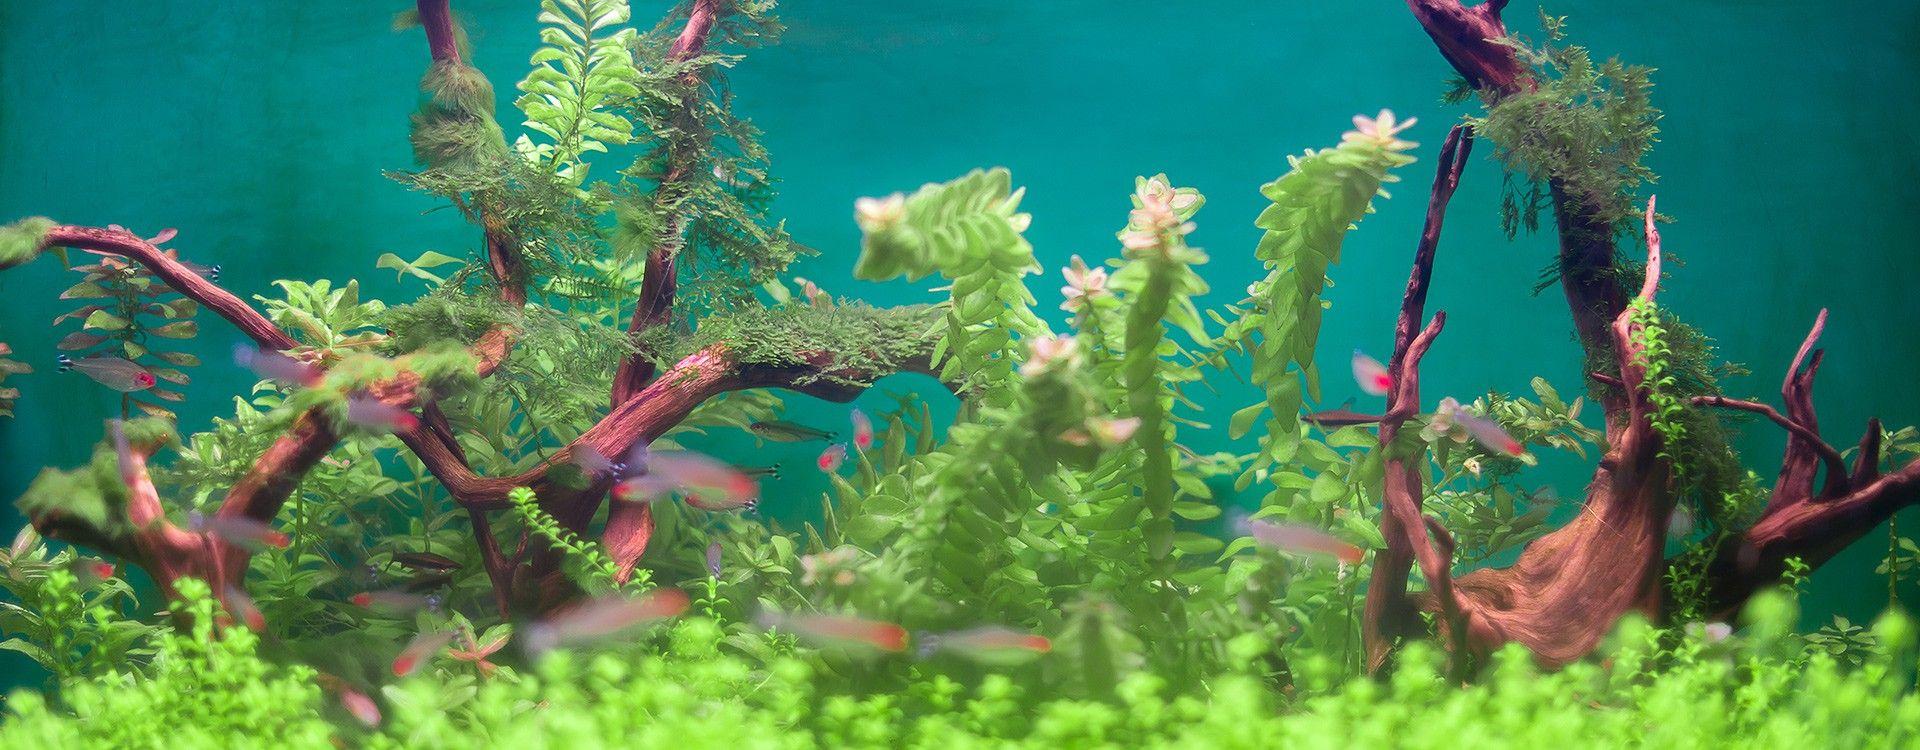 Sukces Akwarium Roślinnego Planta Garden